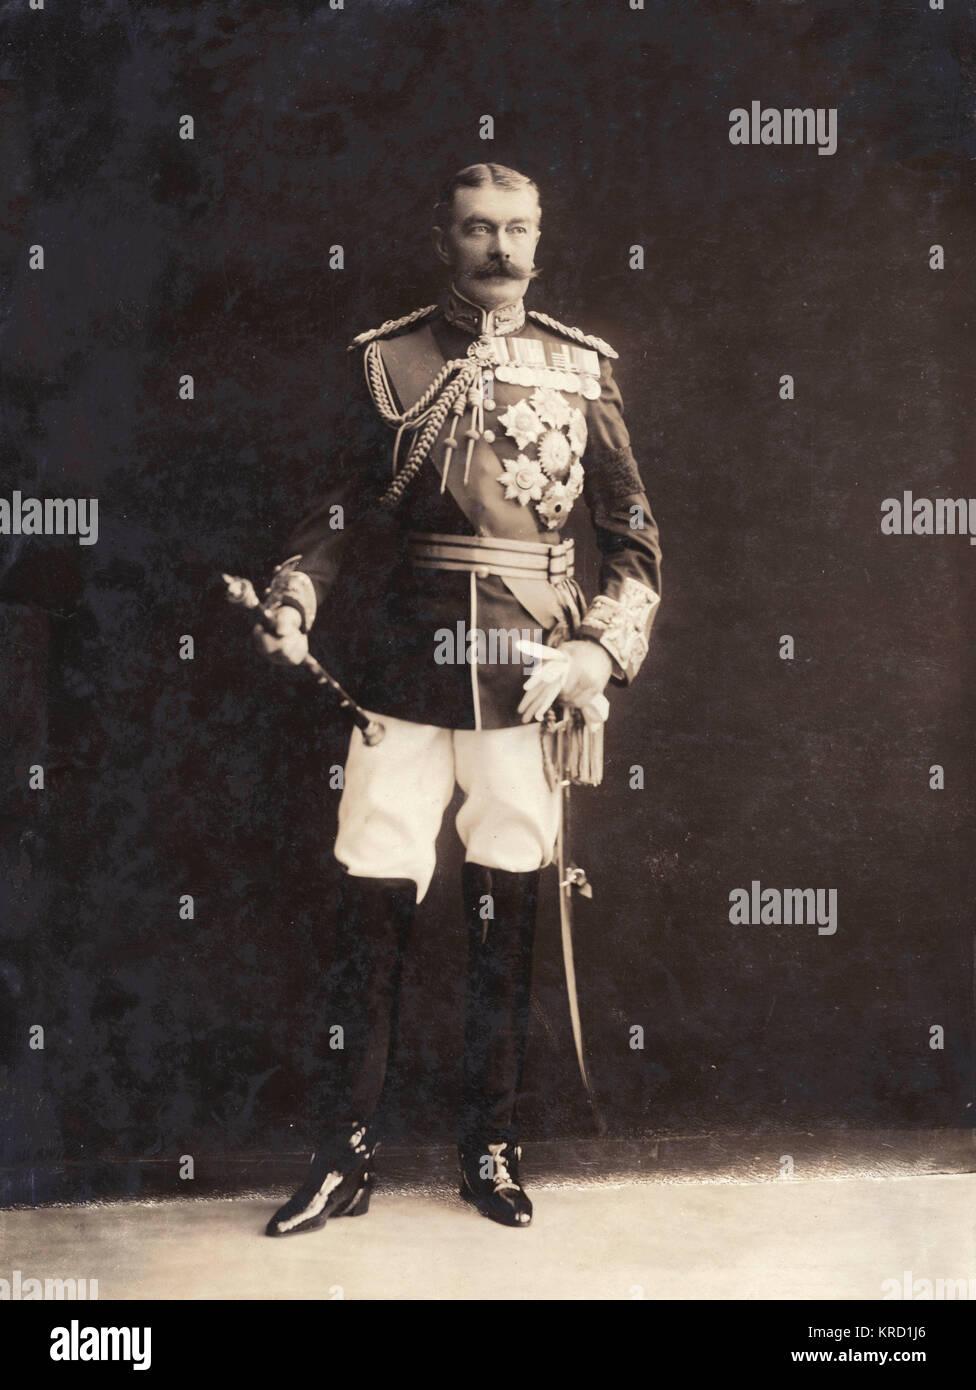 Field Marshal Horatio Herbert Kitchener, 1st Earl Kitchener (1850-1916), British Field Marshal, a diplomat, and - Stock Image